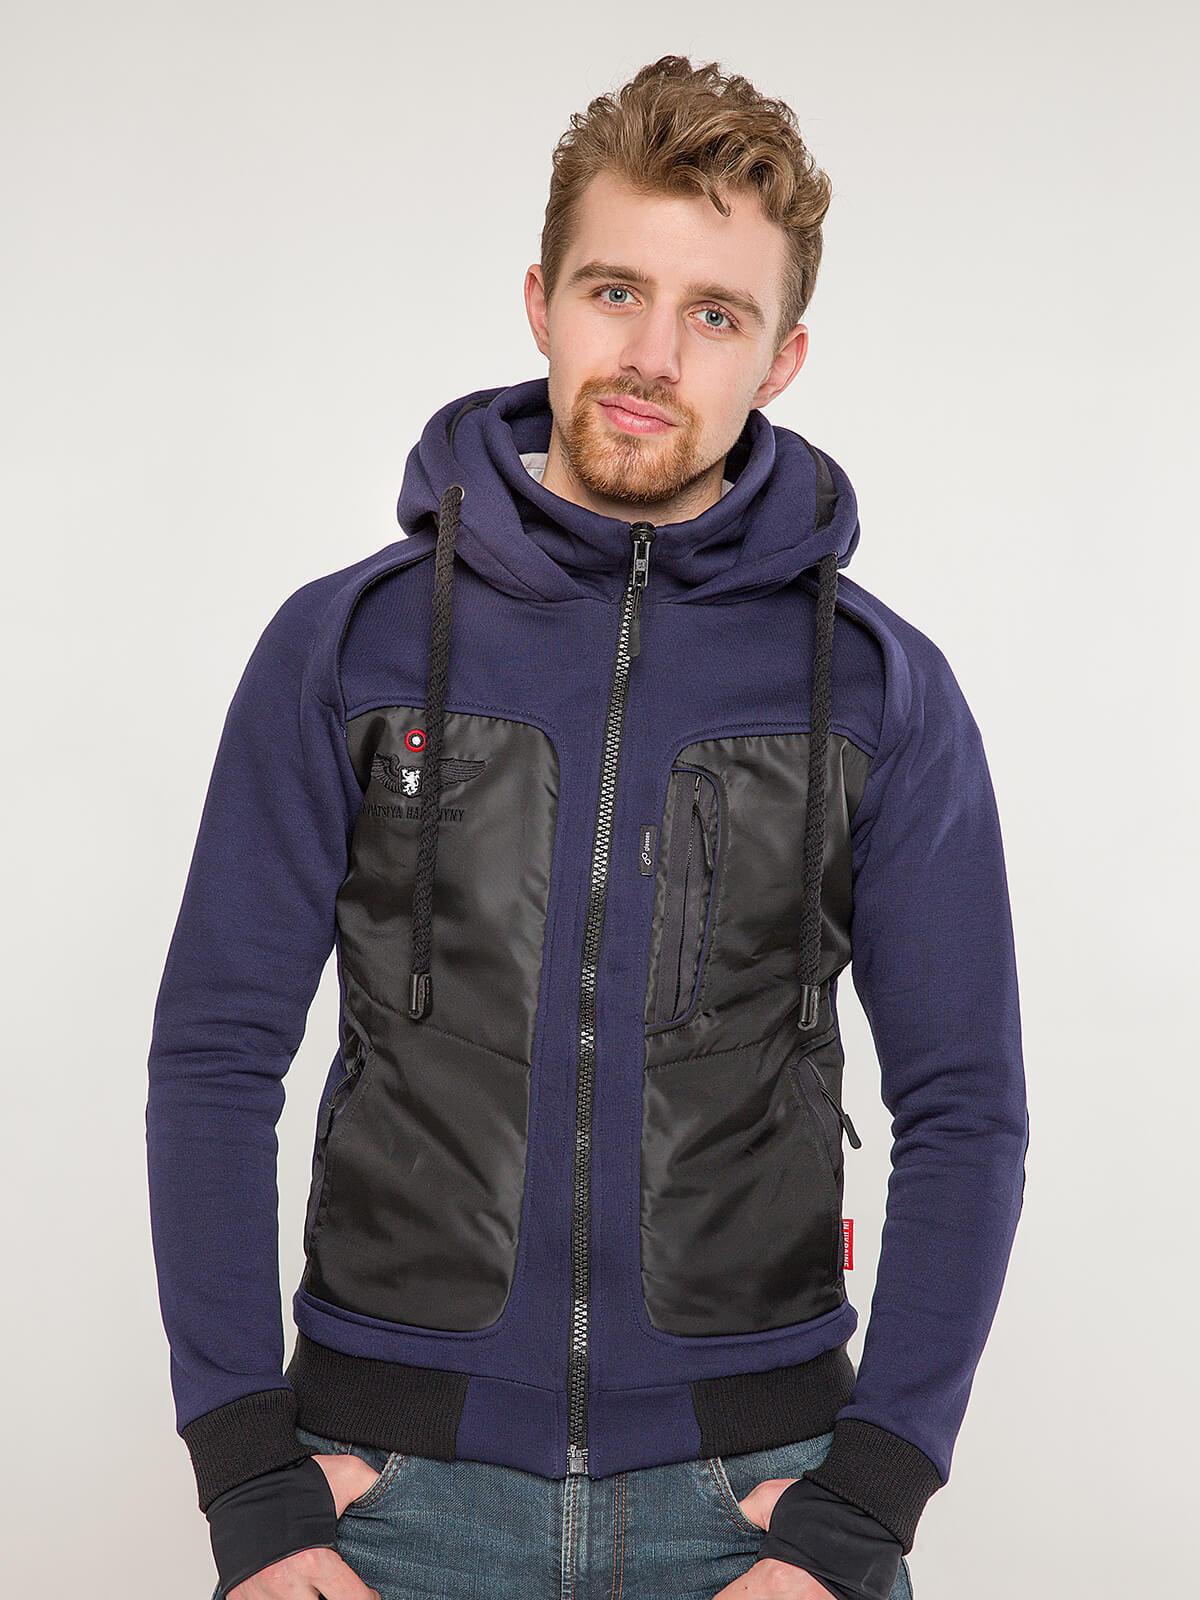 Men's Hoodie Syla. Color navy blue. Unisex hoodie (men's sizes).